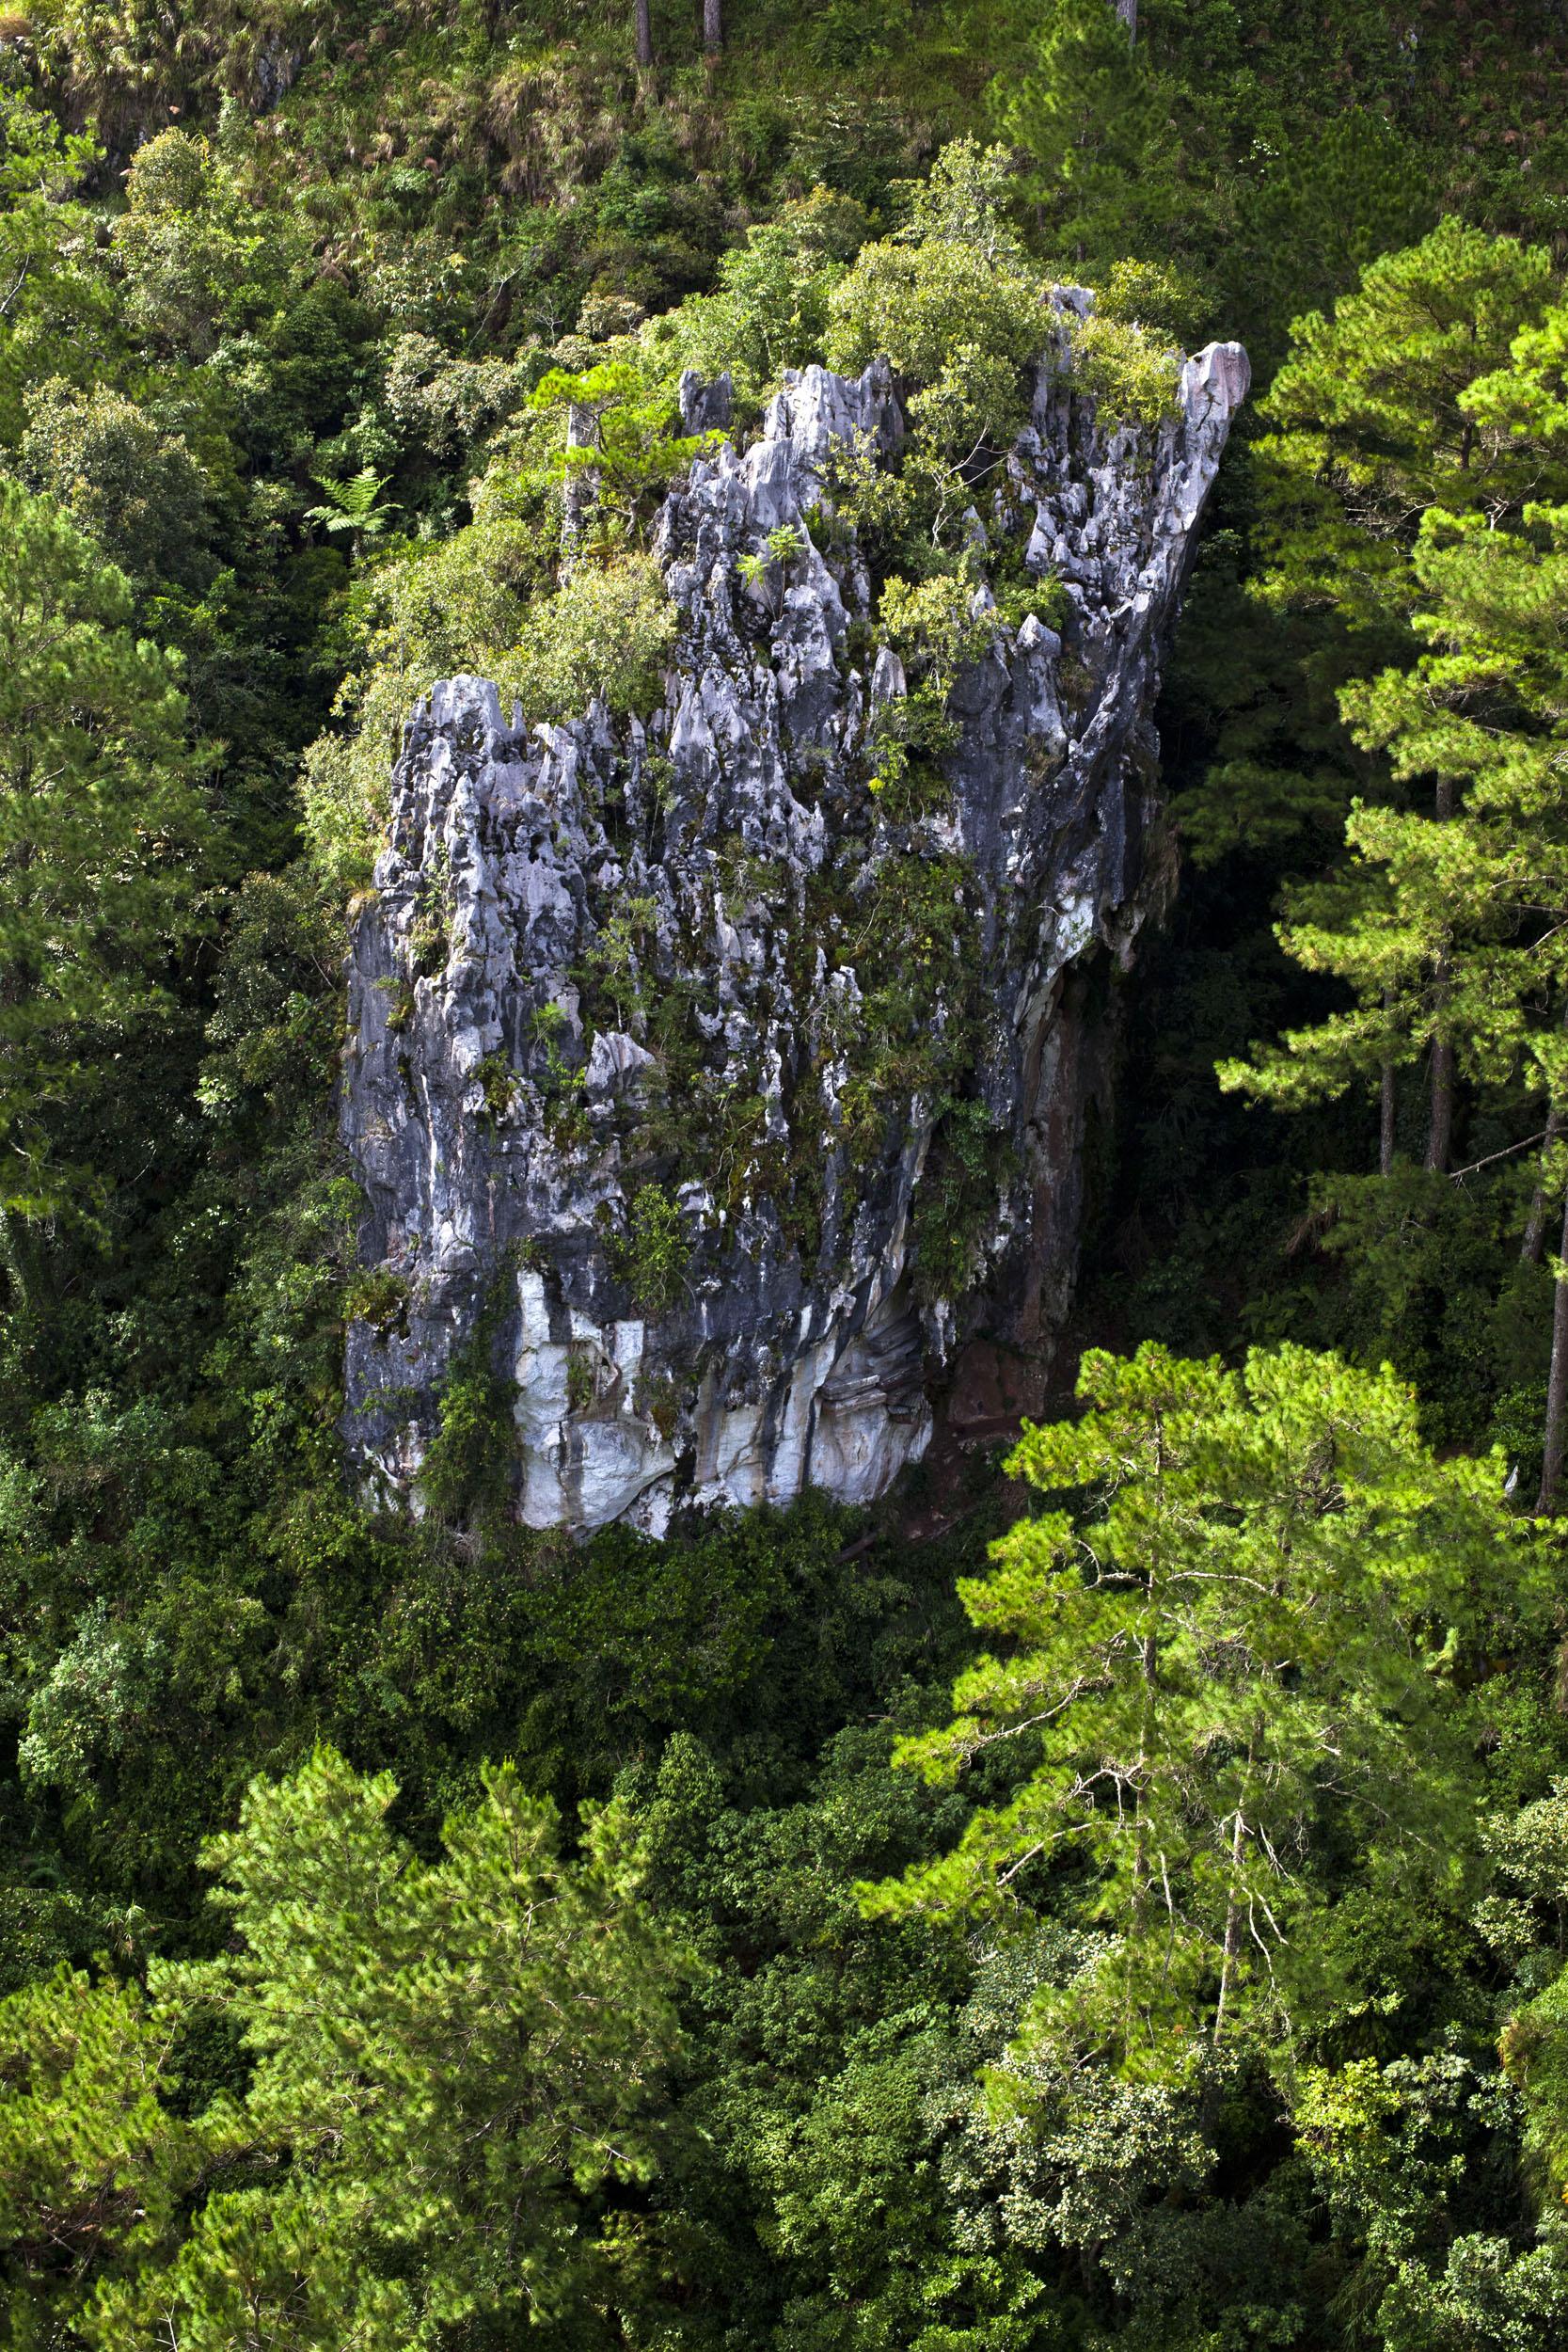 Sagada hanging coffins Mountain Province northern Philippines Aug 2011 03